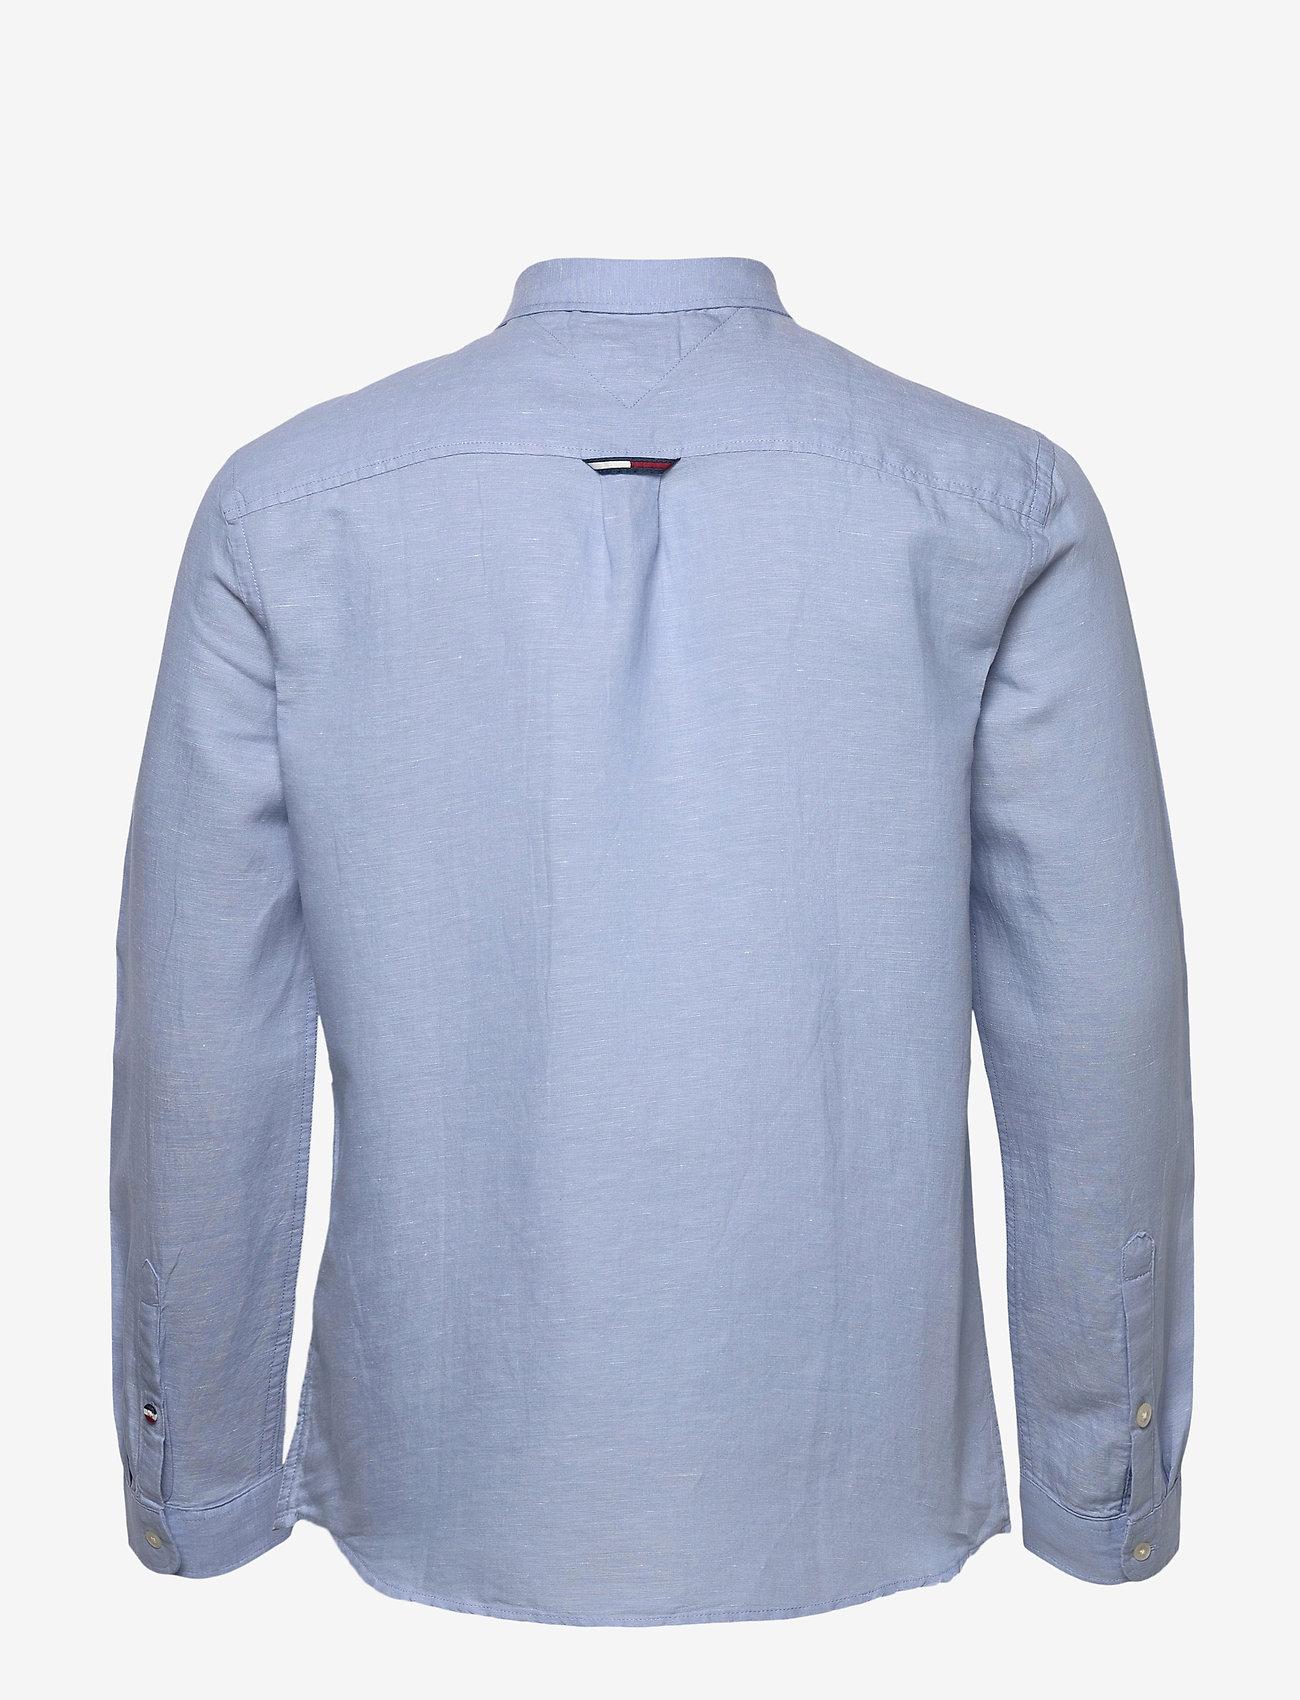 Tommy Jeans - TJM LINEN BLEND SHIRT - rutiga skjortor - light blue - 1